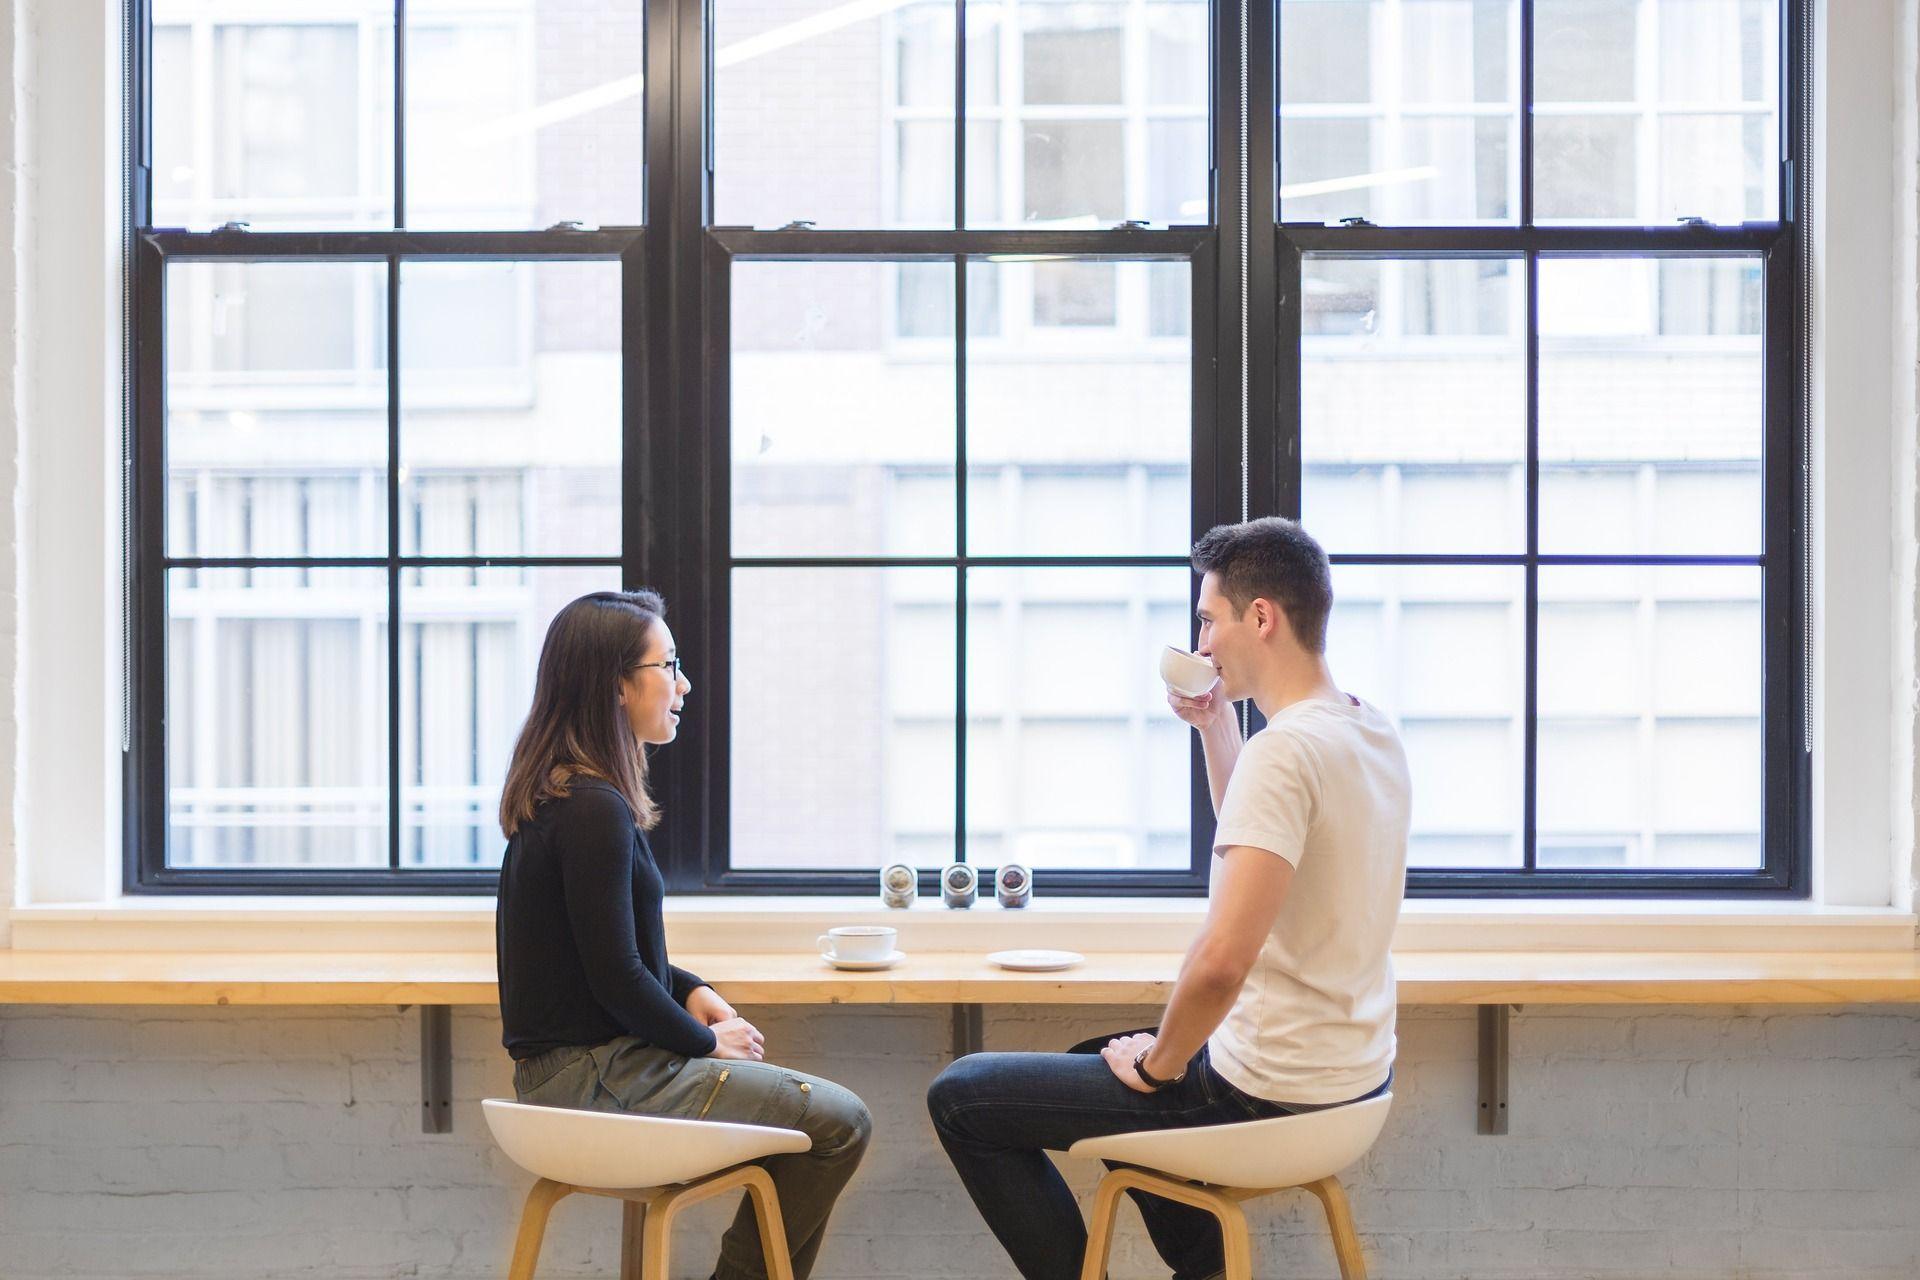 Two people having coffee; NCLEX study plan